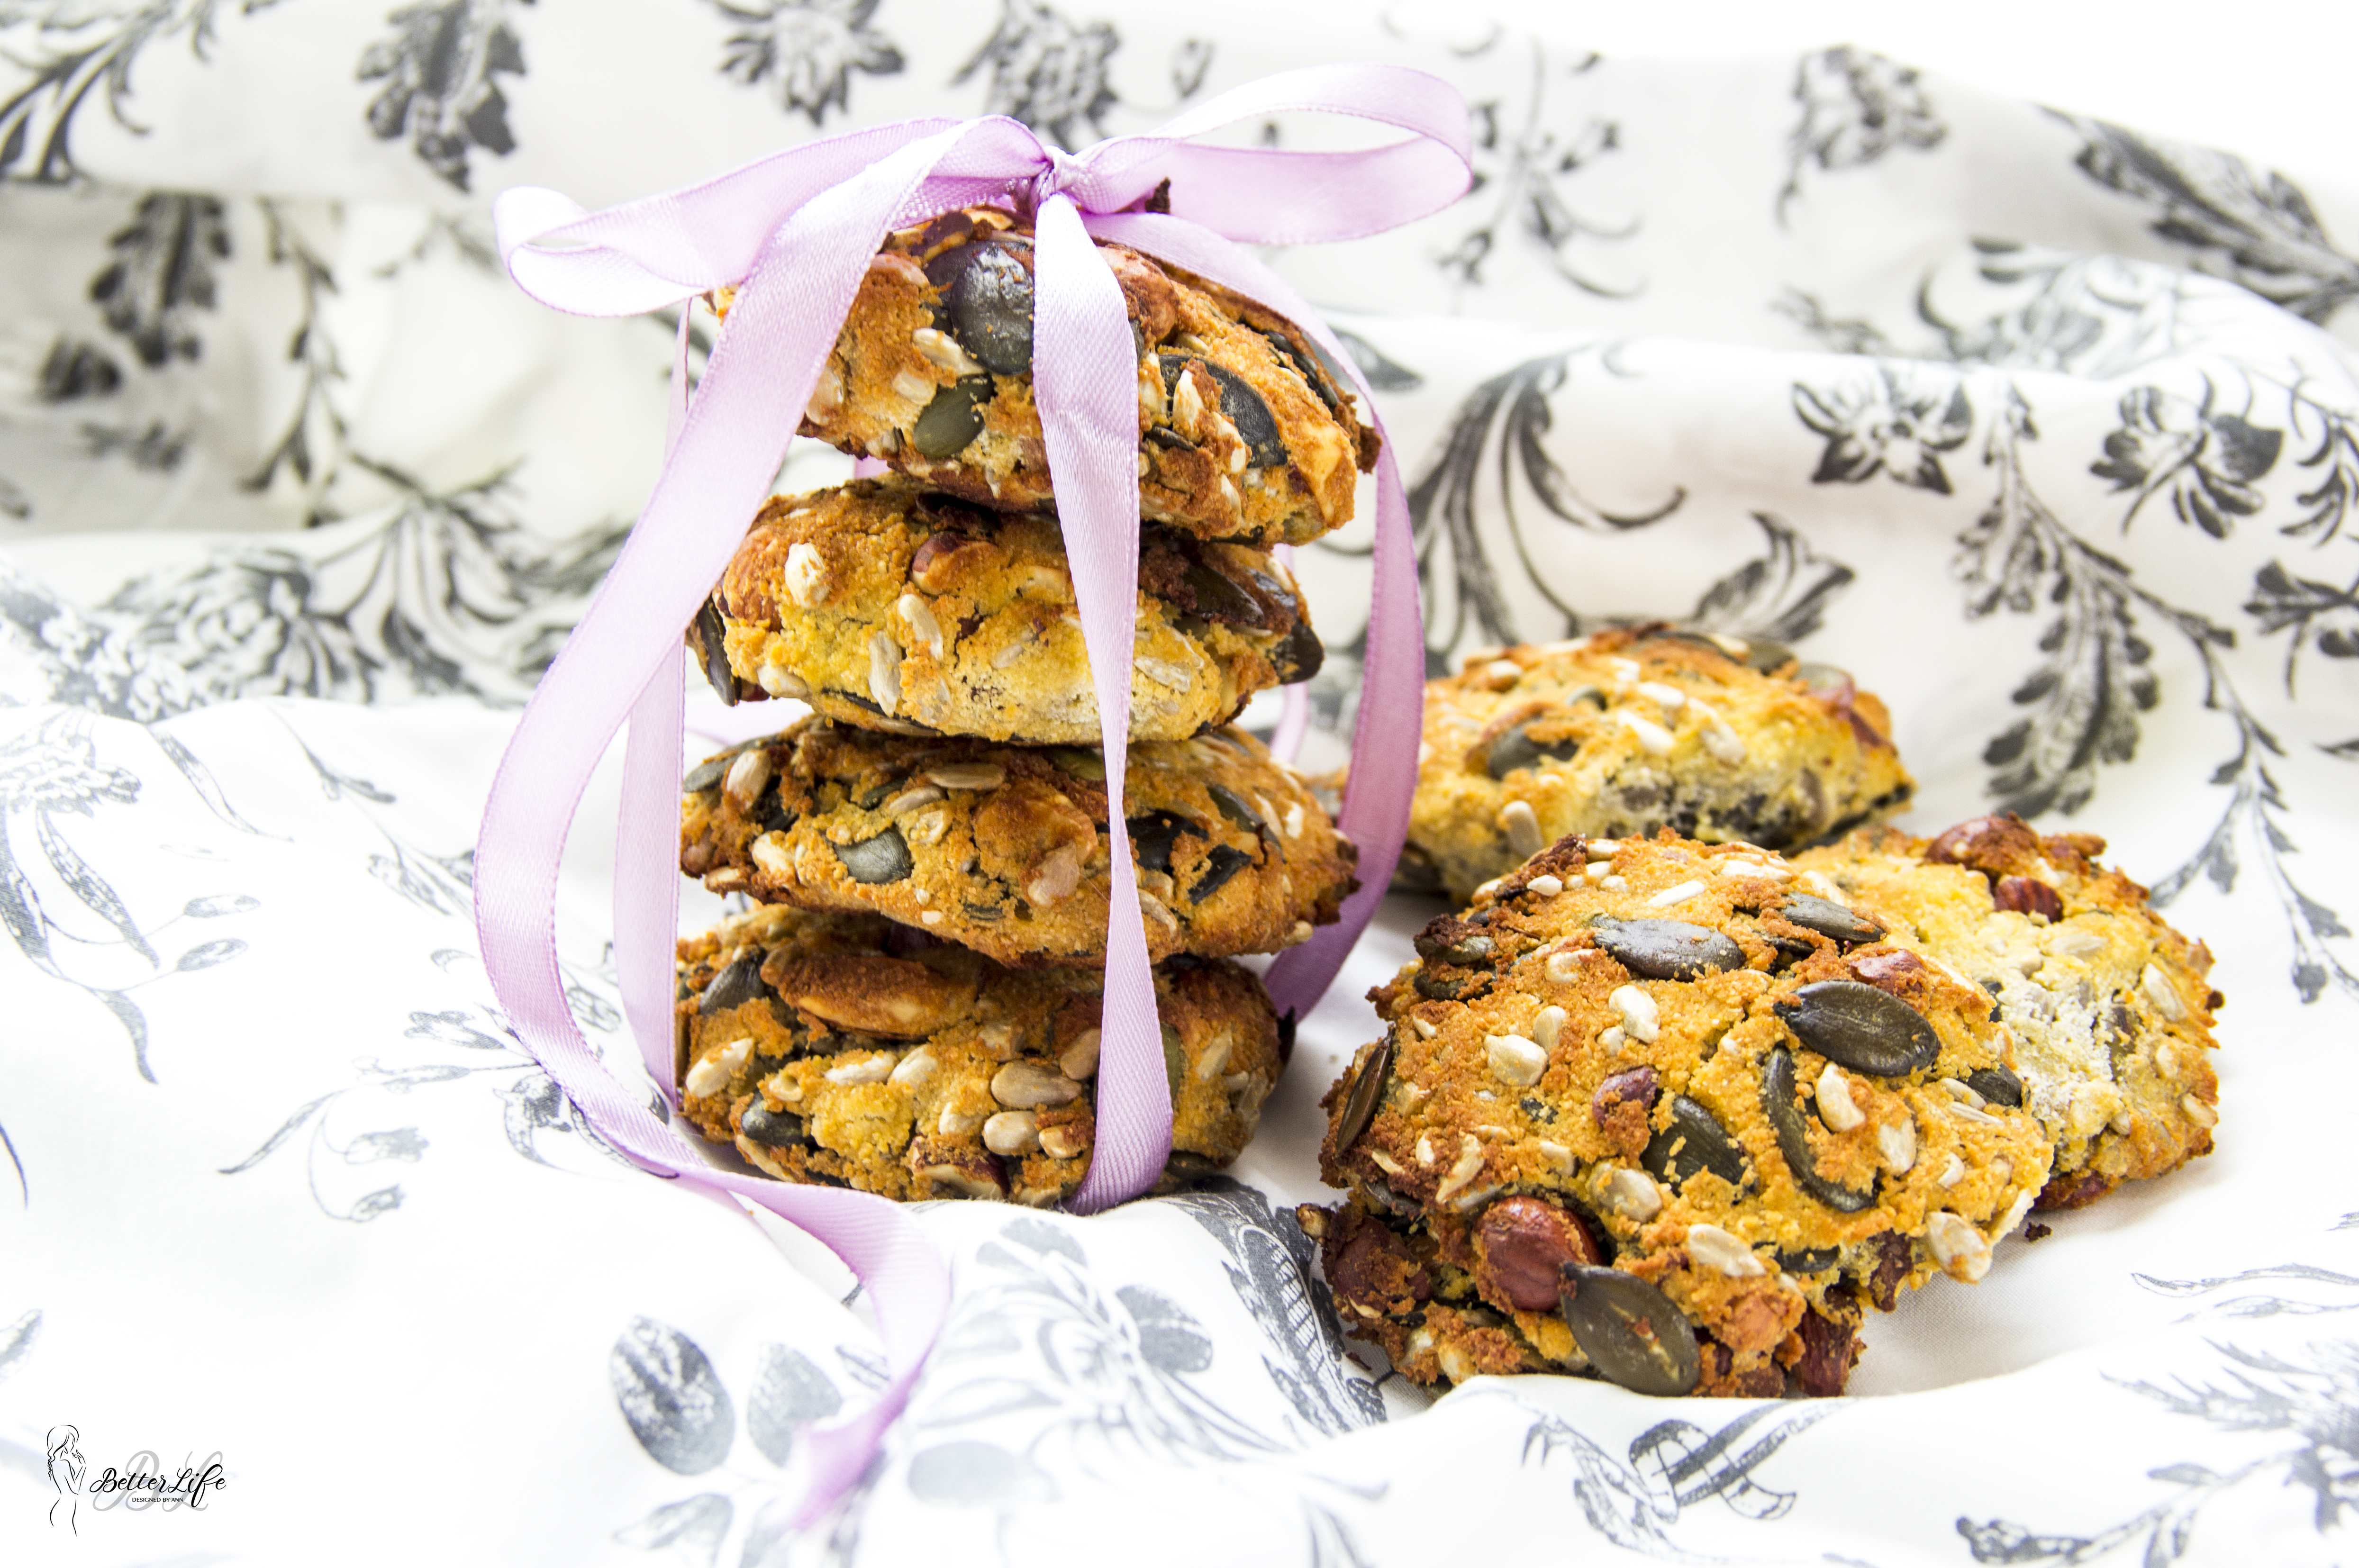 Cookies (: